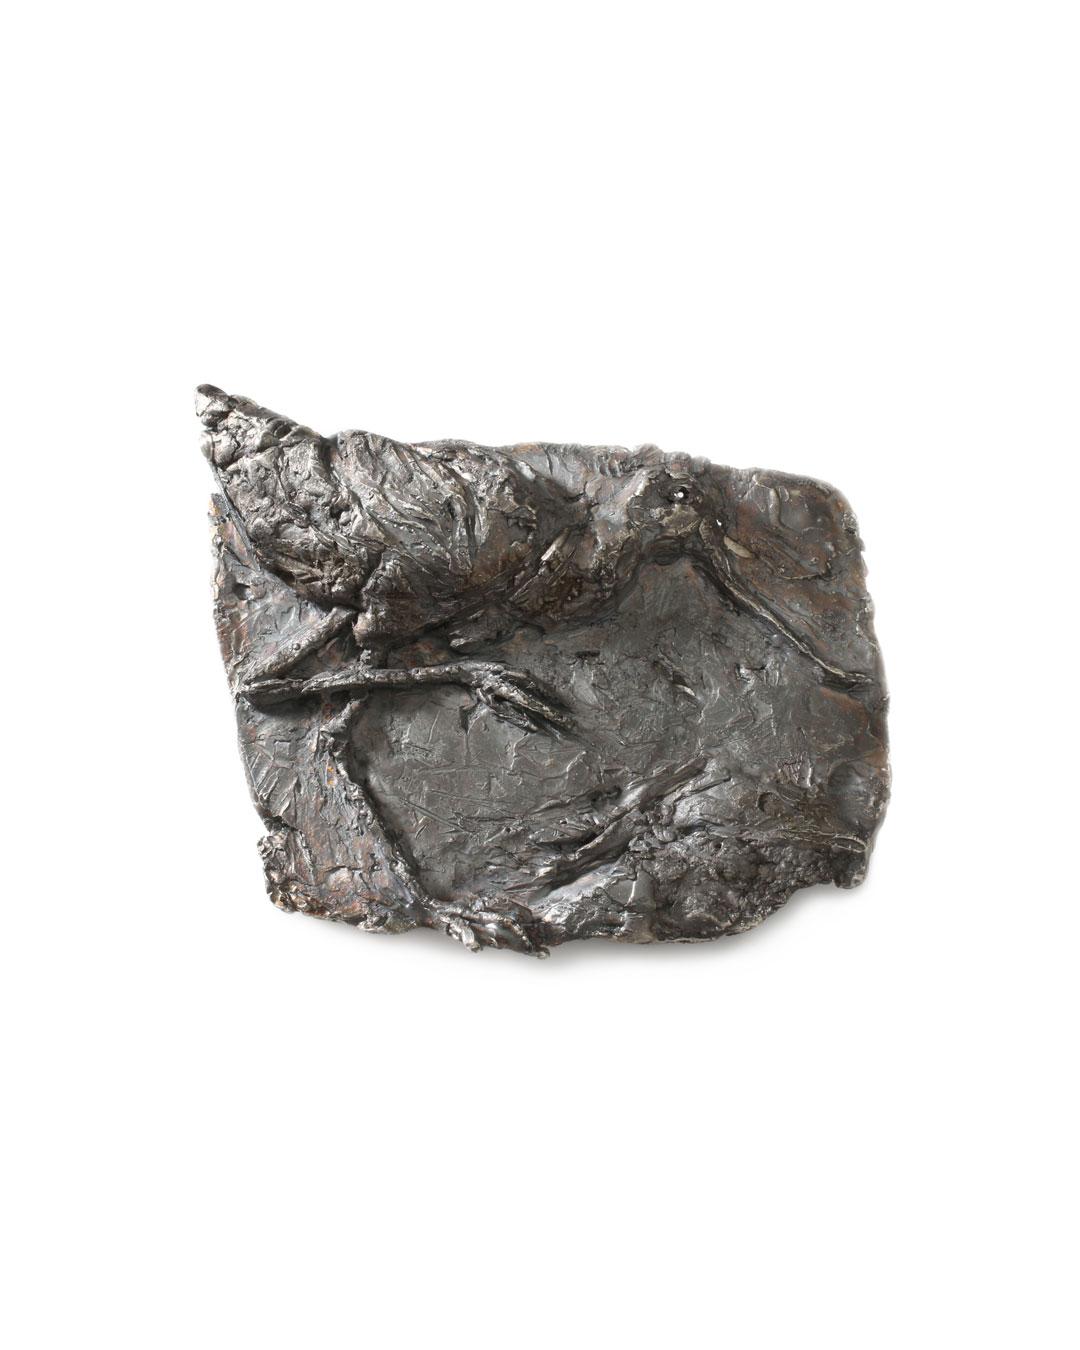 Juliane Brandes, zonder titel, 2013, broche; zilver, 65 x 50 mm, €1575